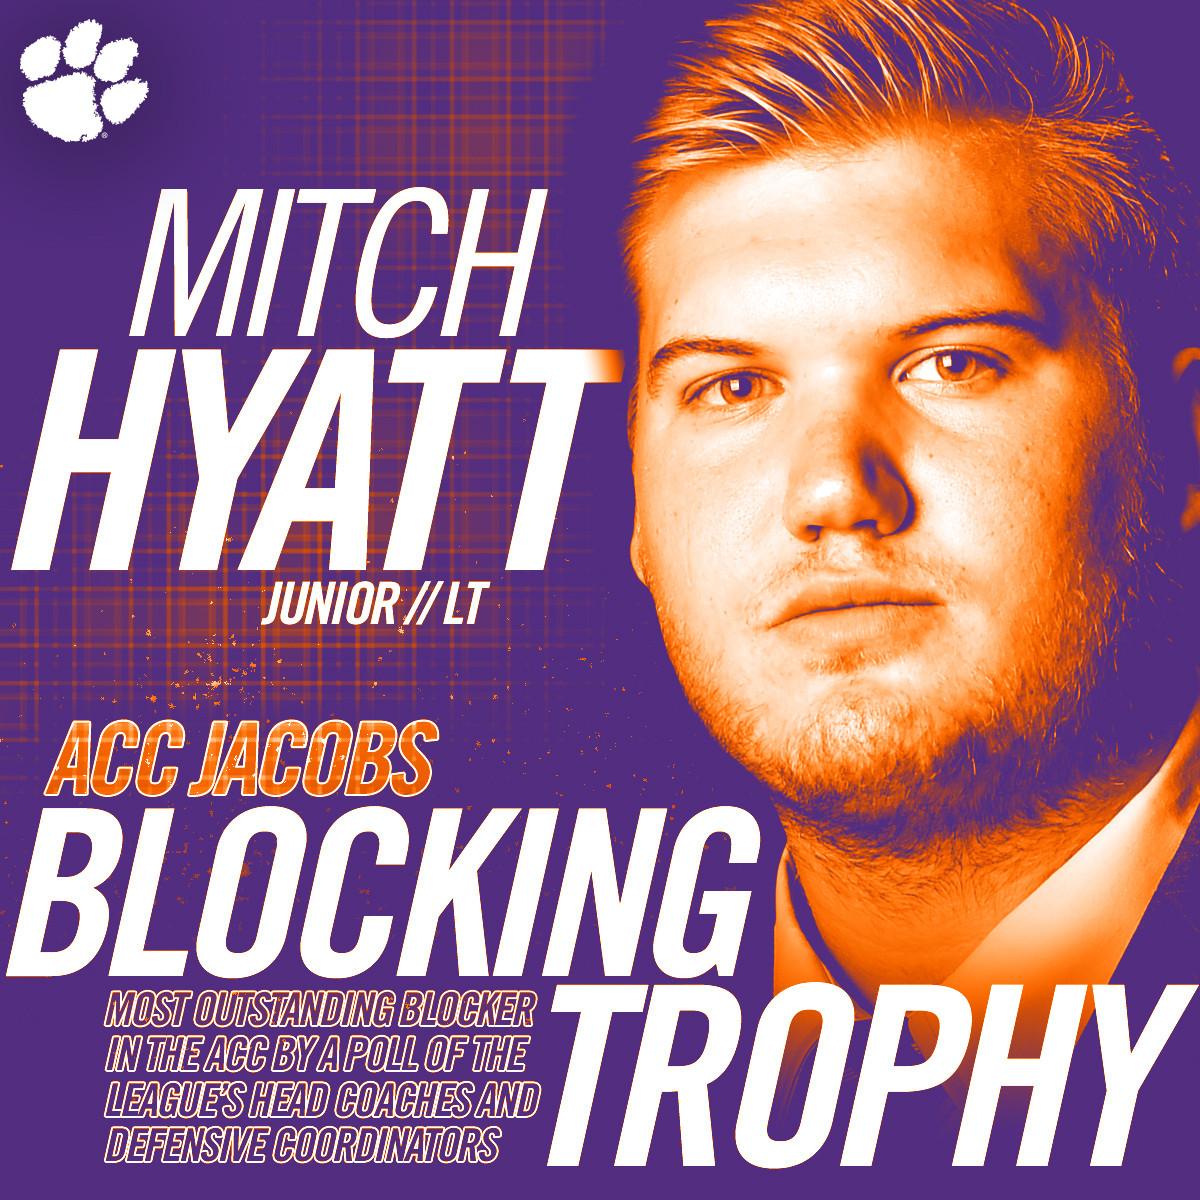 Hyatt Winner of Jacobs Blocking Trophy